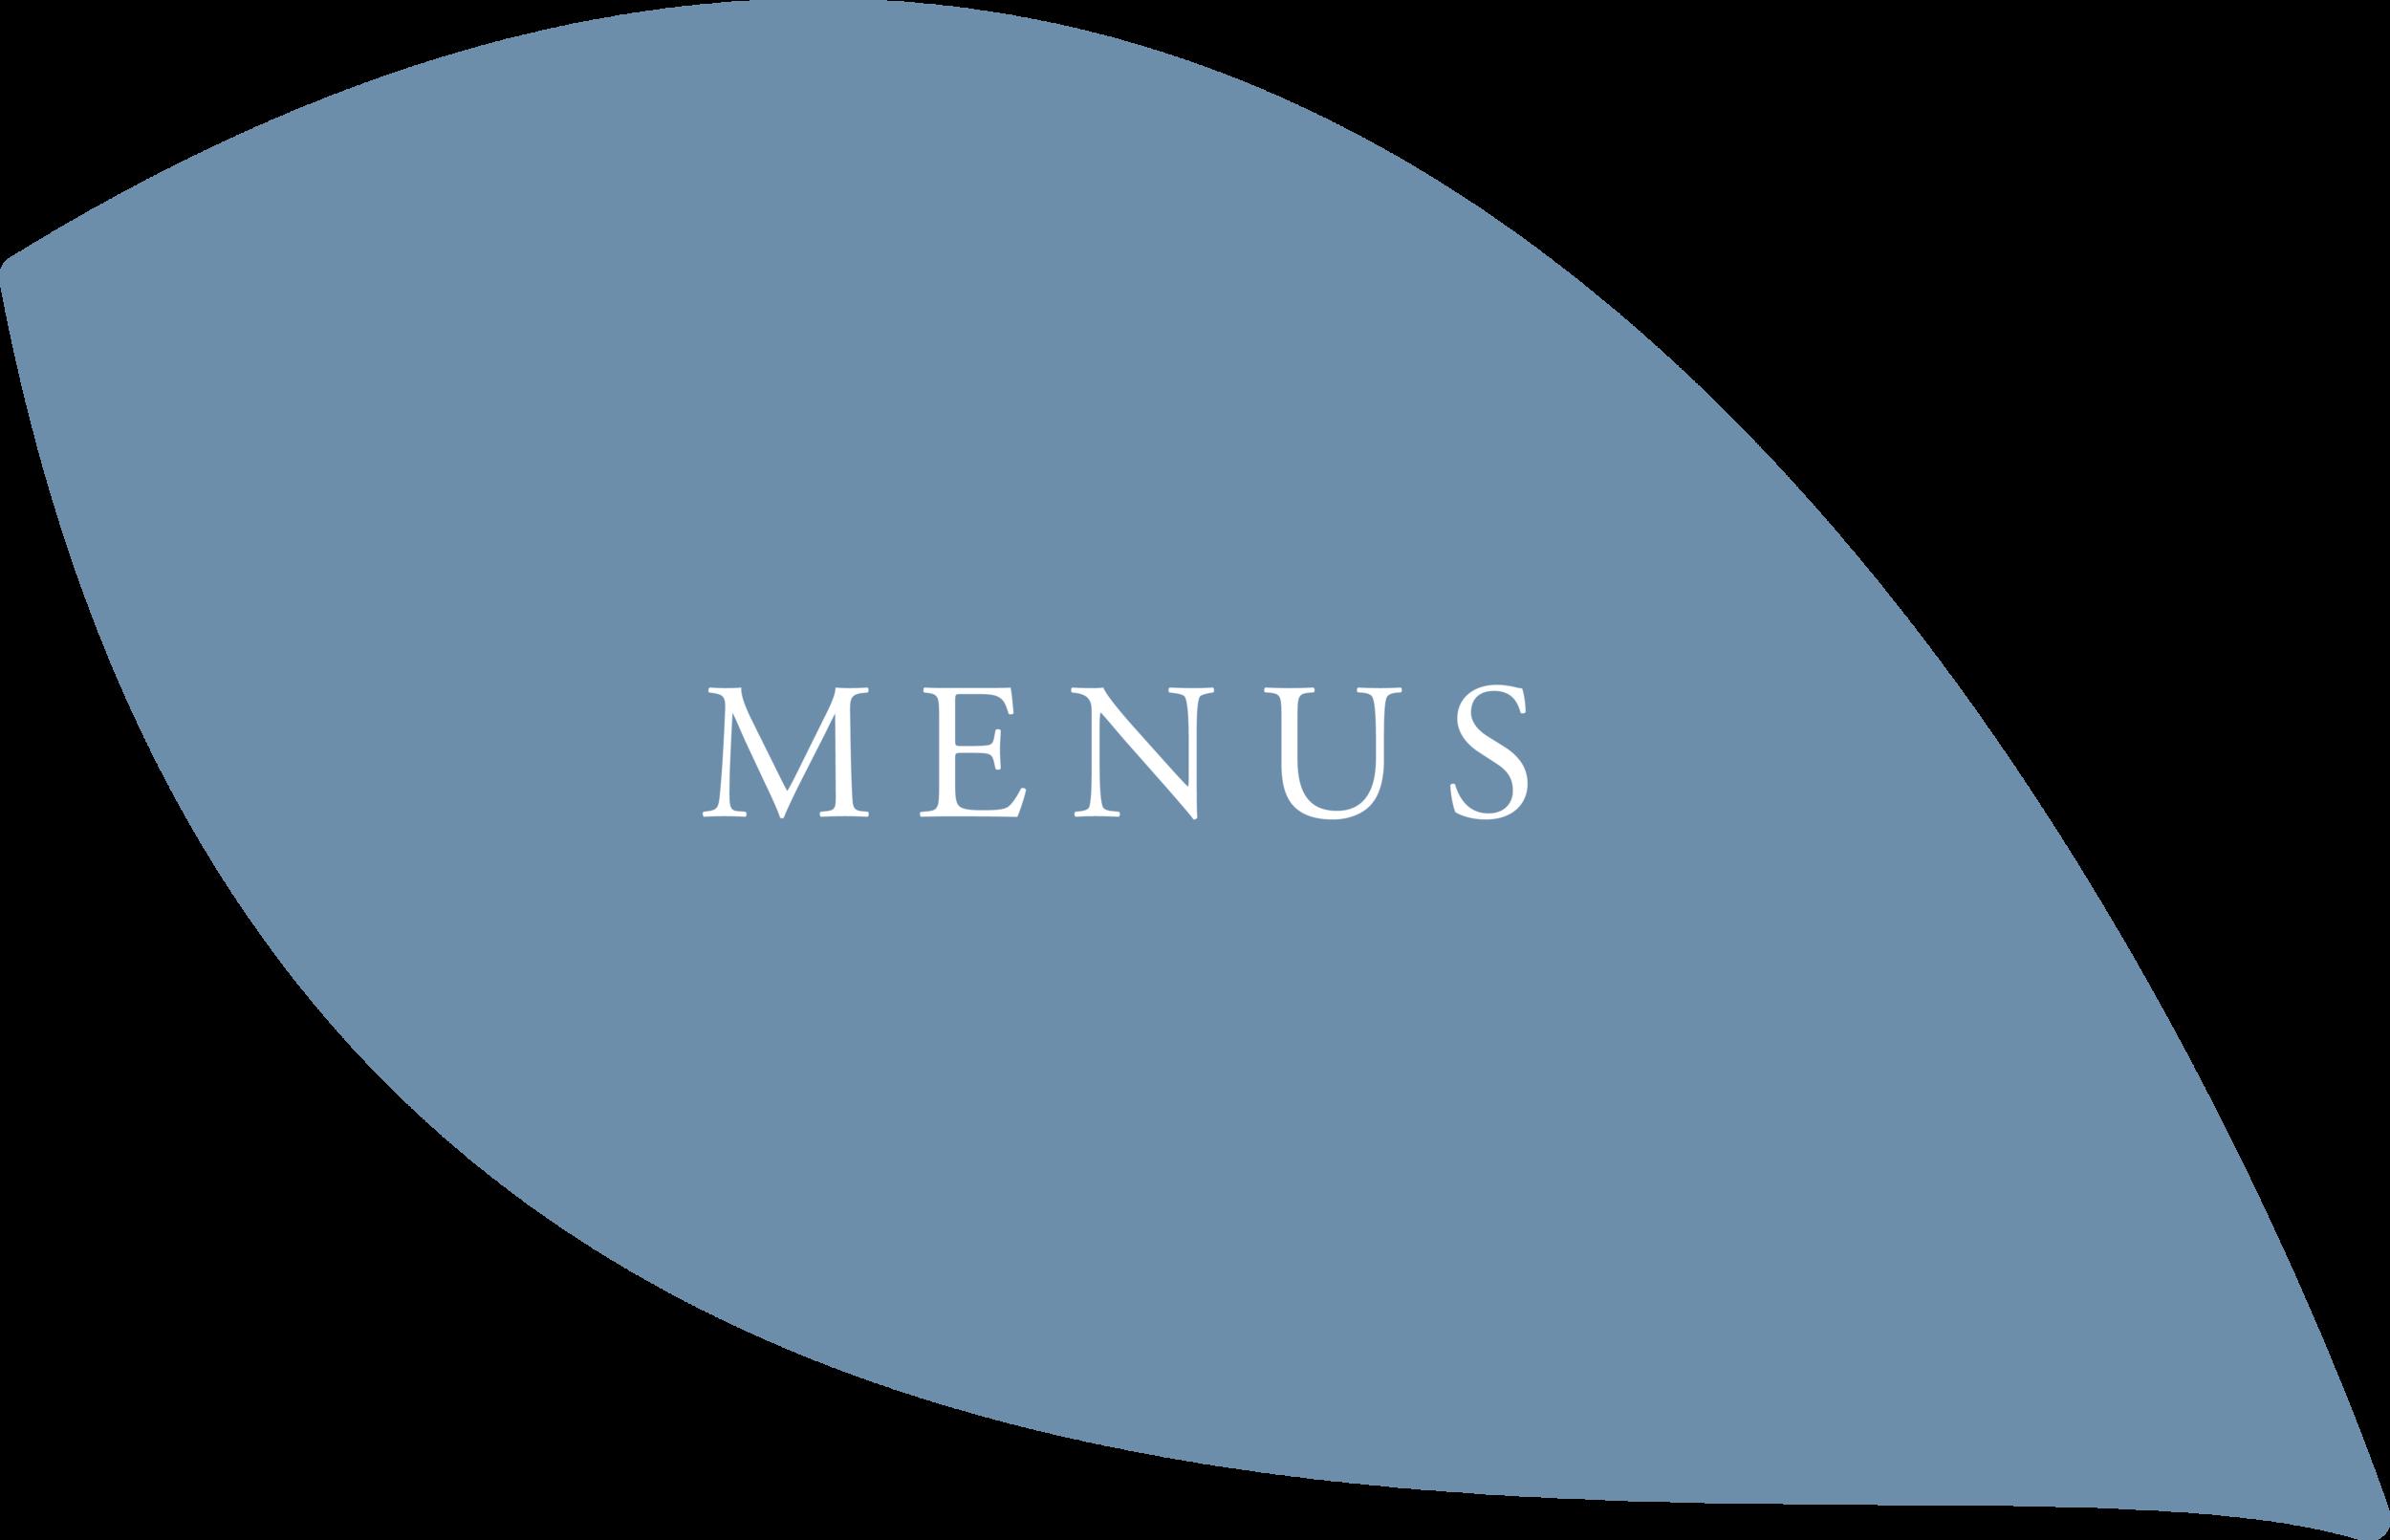 oak-terrace-at-rose-hill-restaurant-and-event-venue-bluffton-sc-blue-leaf-menus-artwork.png